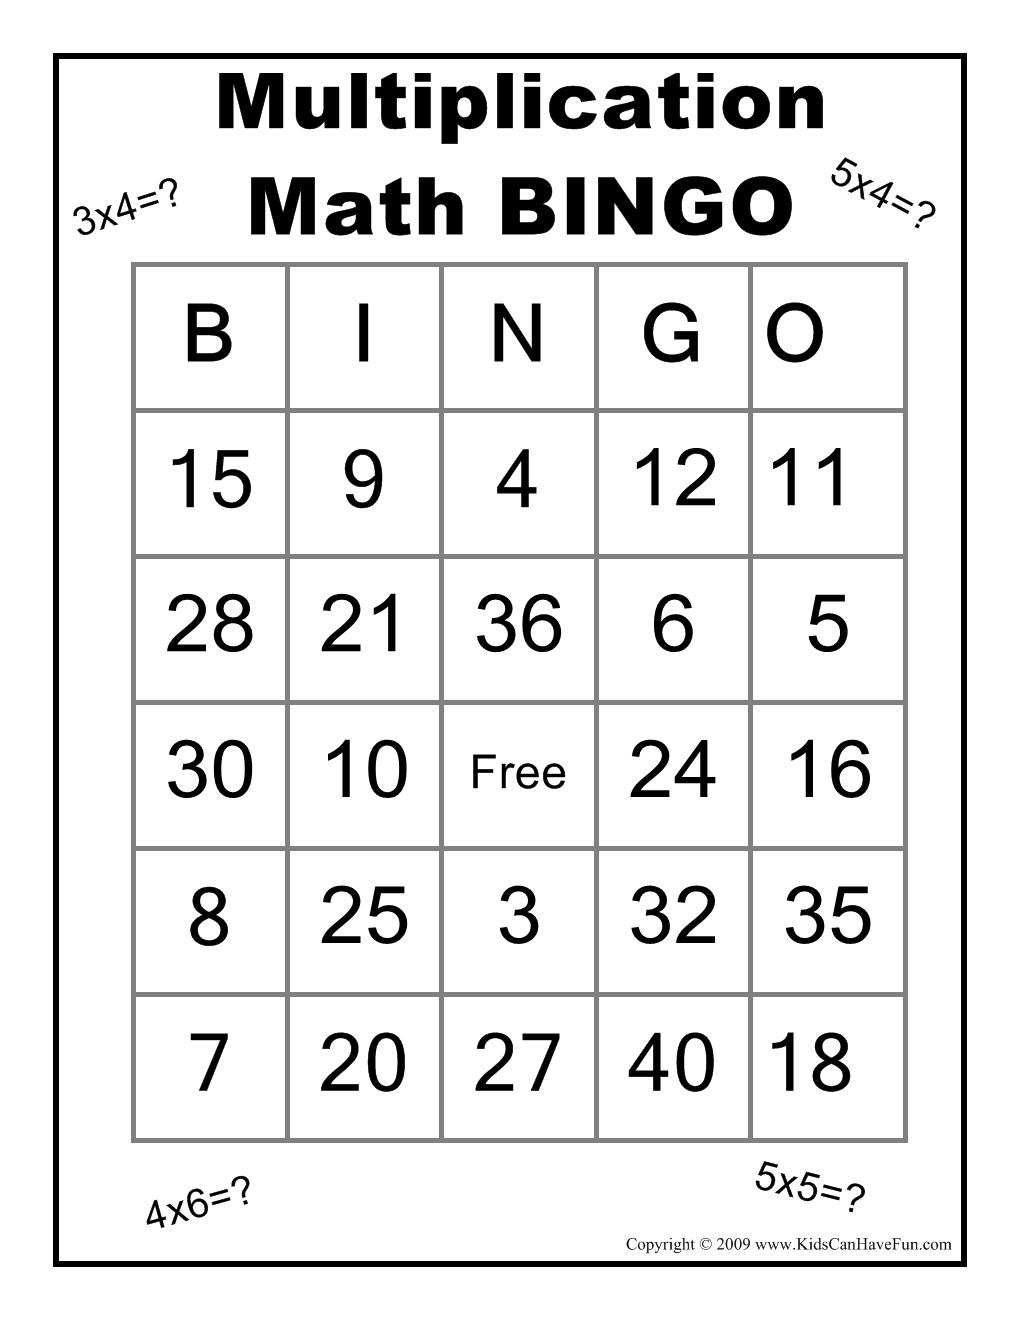 Multiplication Math Bingo Game Http://www.kidscanhavefun